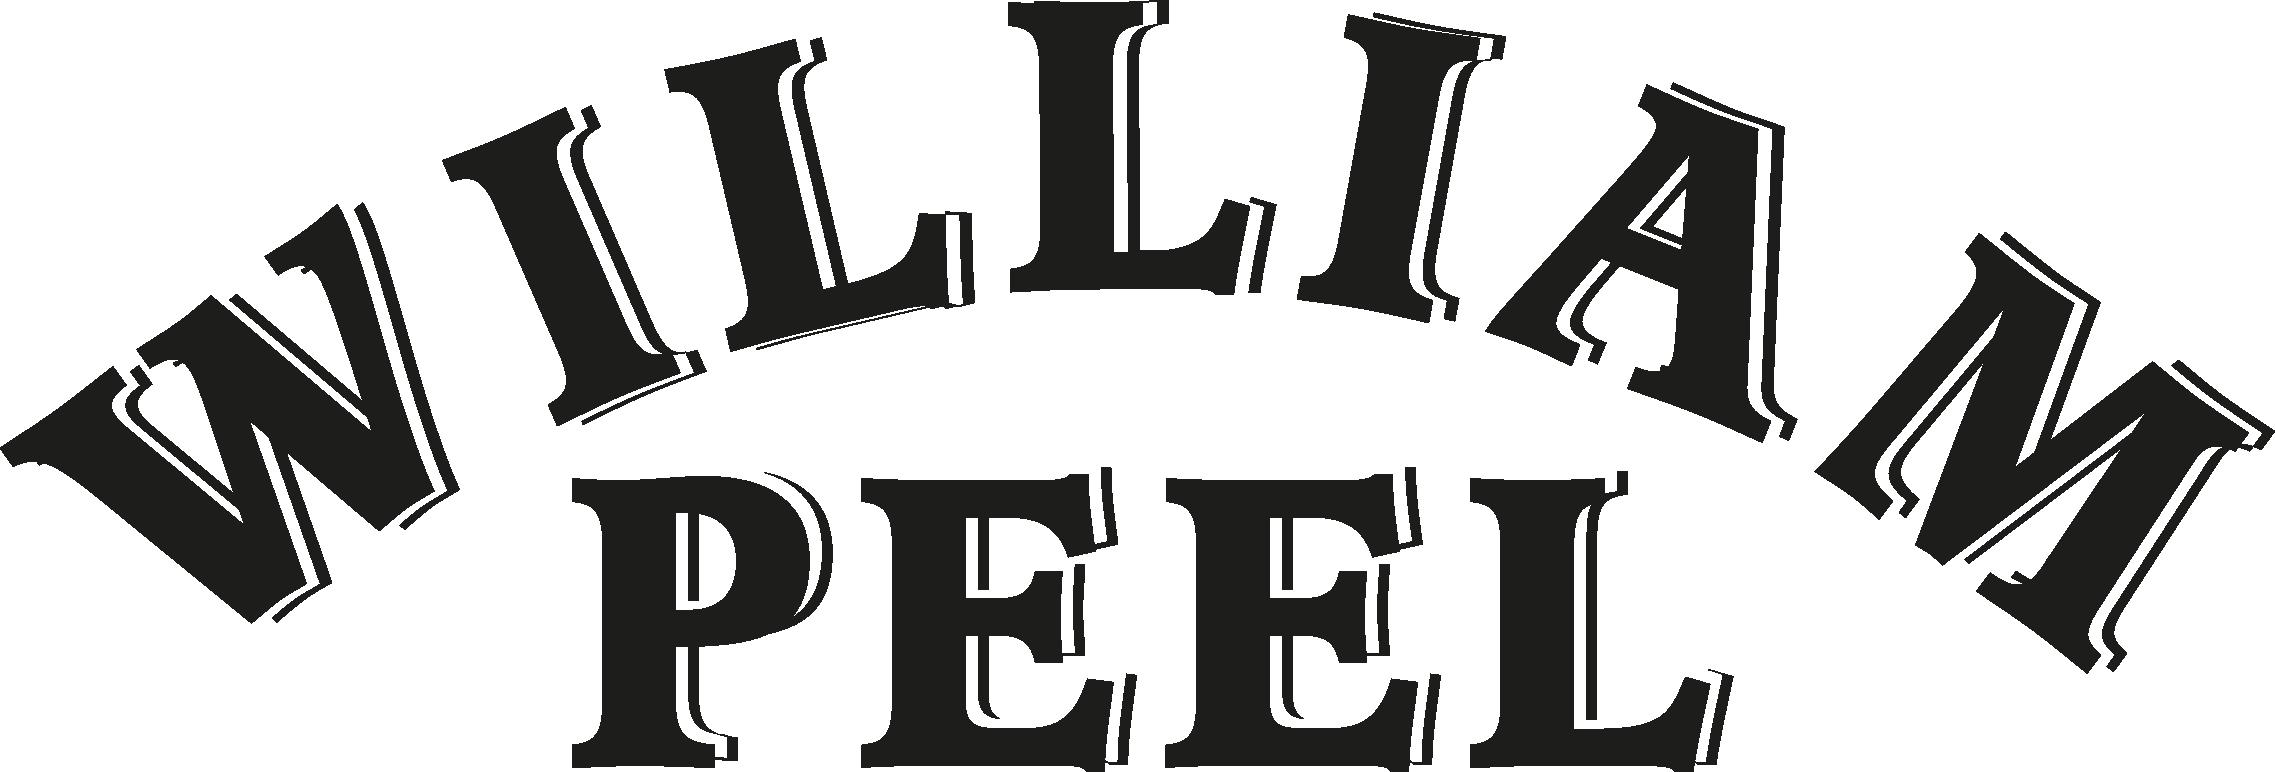 WILLIAN PEEL